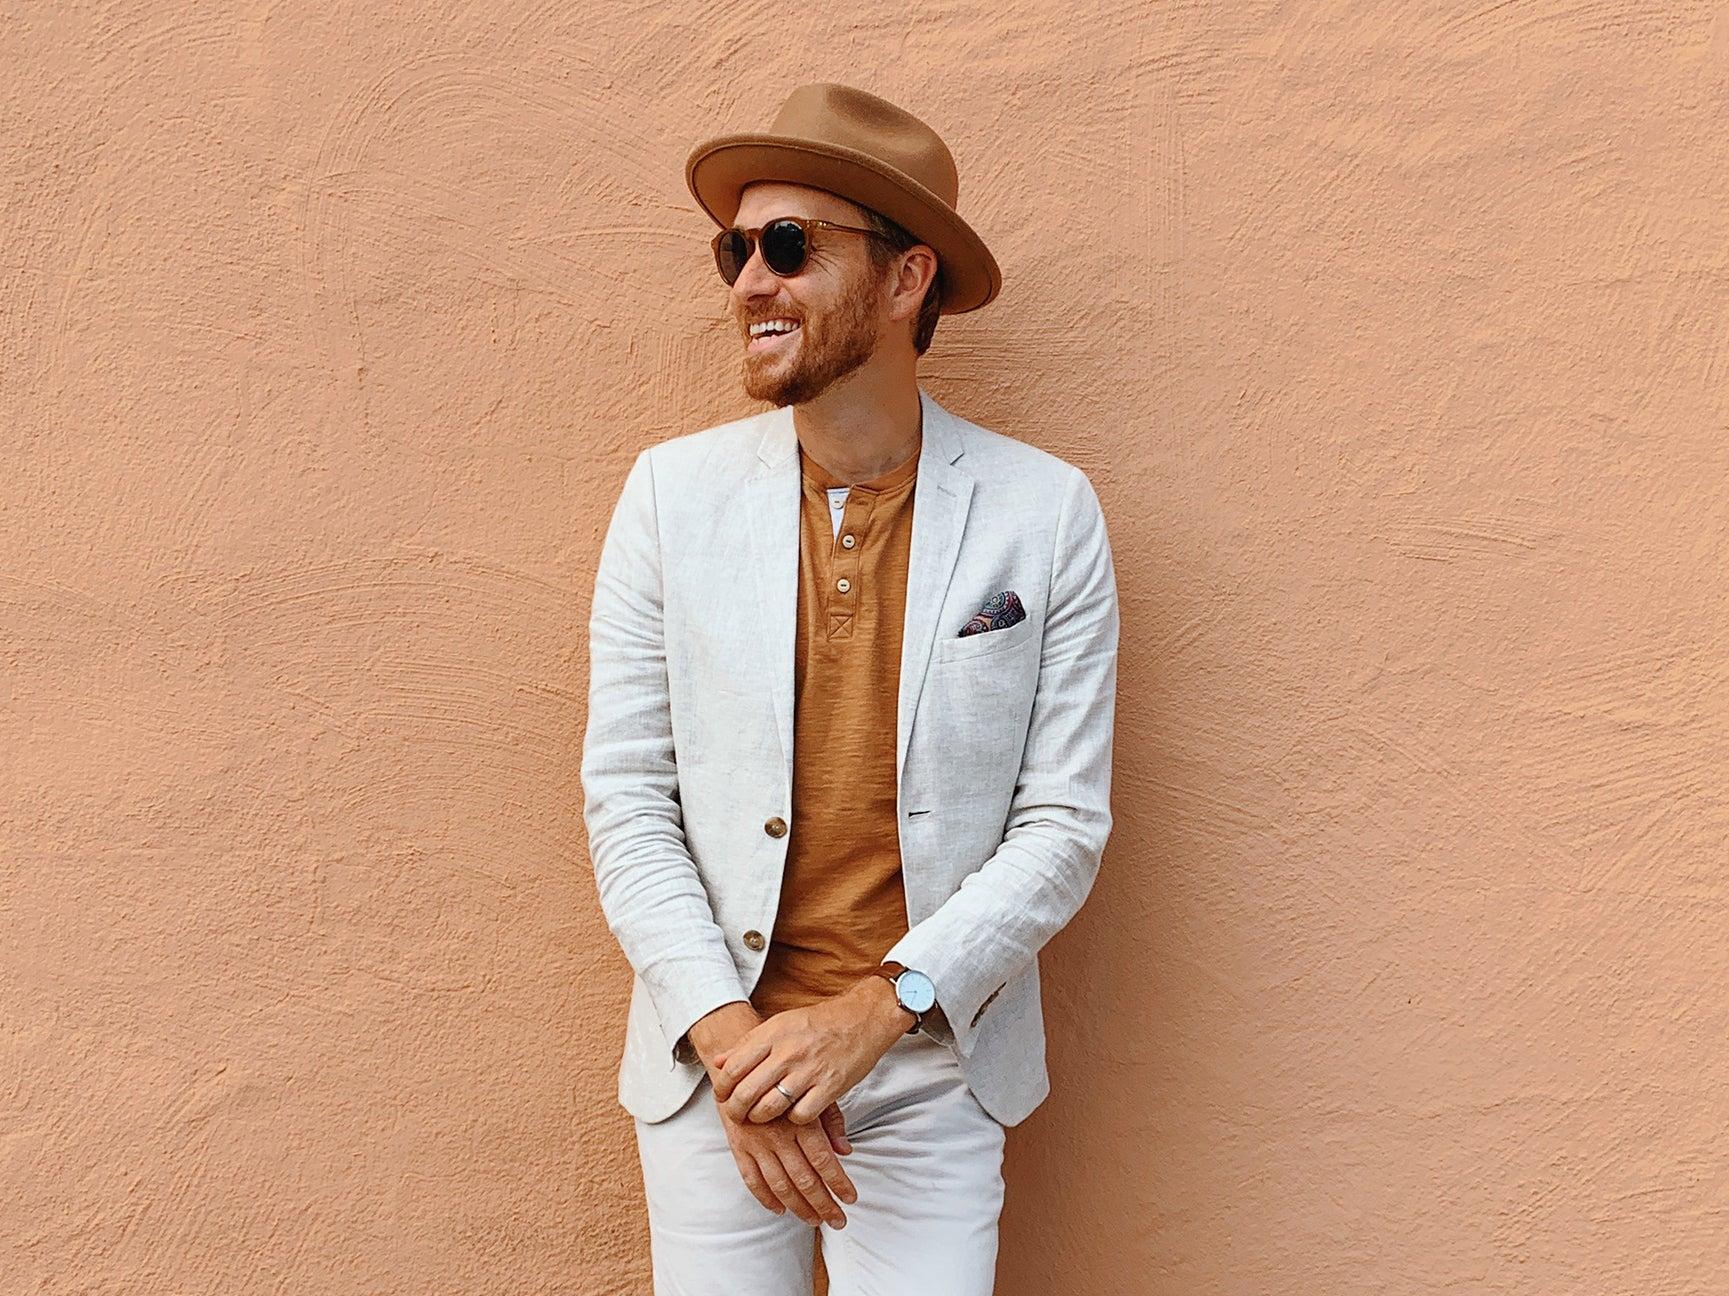 man leaning against a orange wall